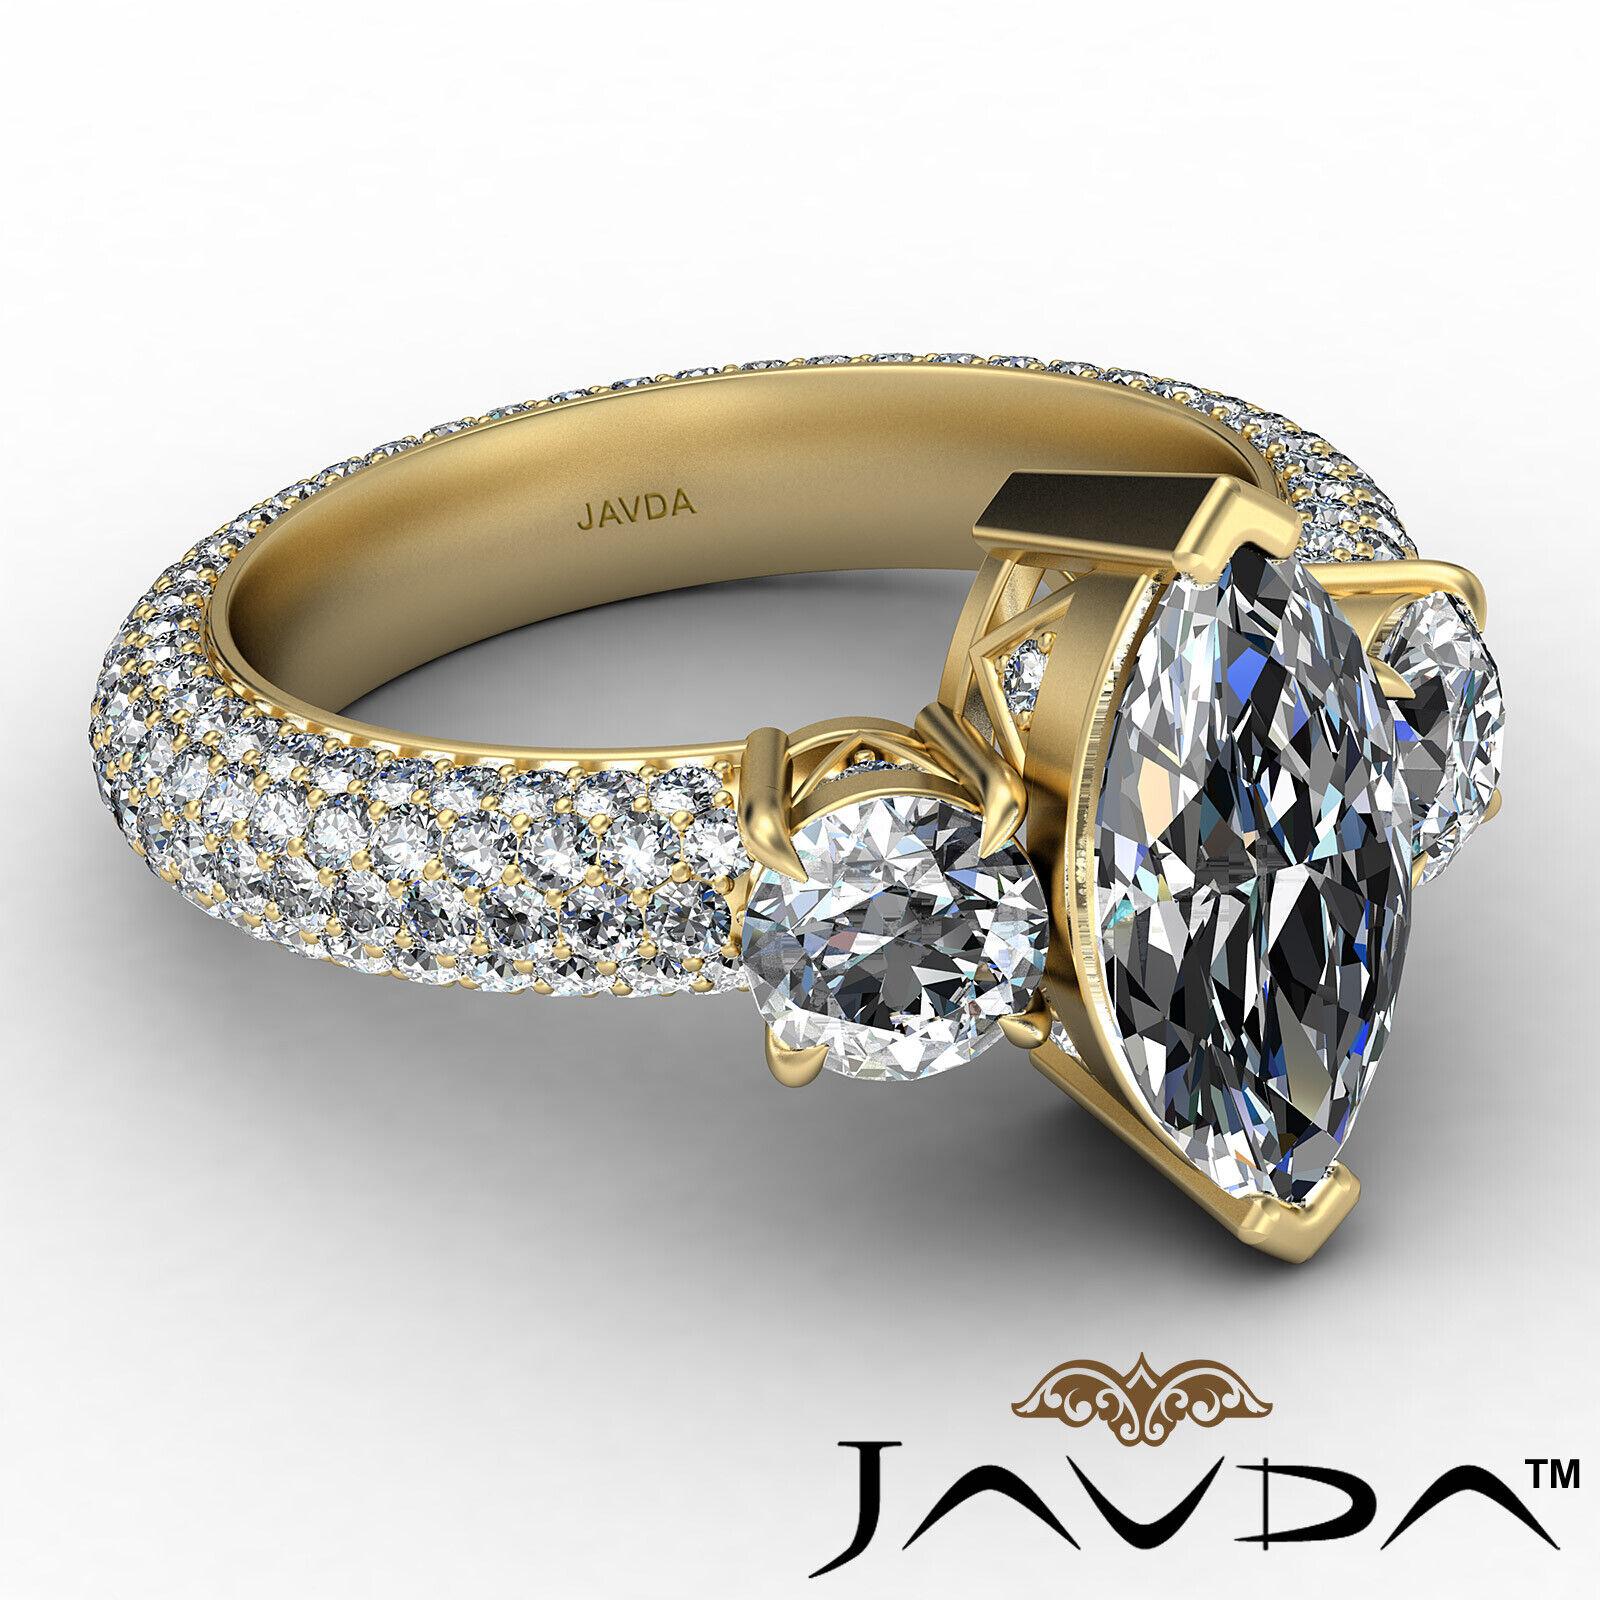 Marquise Diamond Engagement Pave Set Ring GIA K Color & VVS2 clarity 3.05 ctw 7